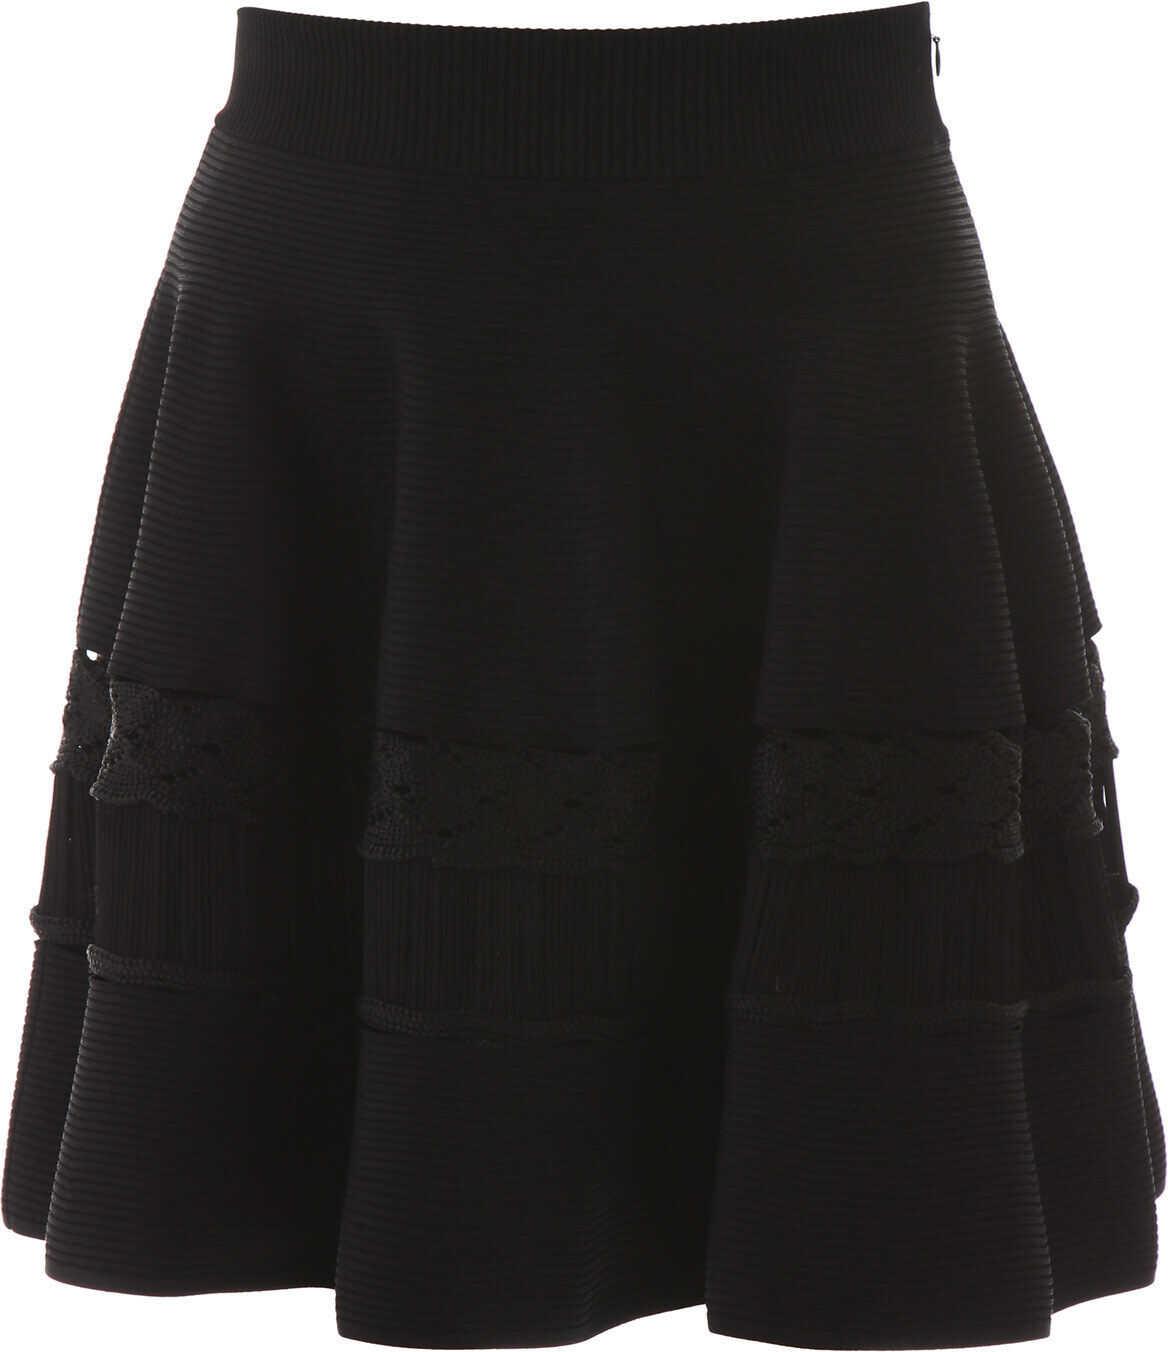 Alexander McQueen Ribbed Knit Skirt BLACK